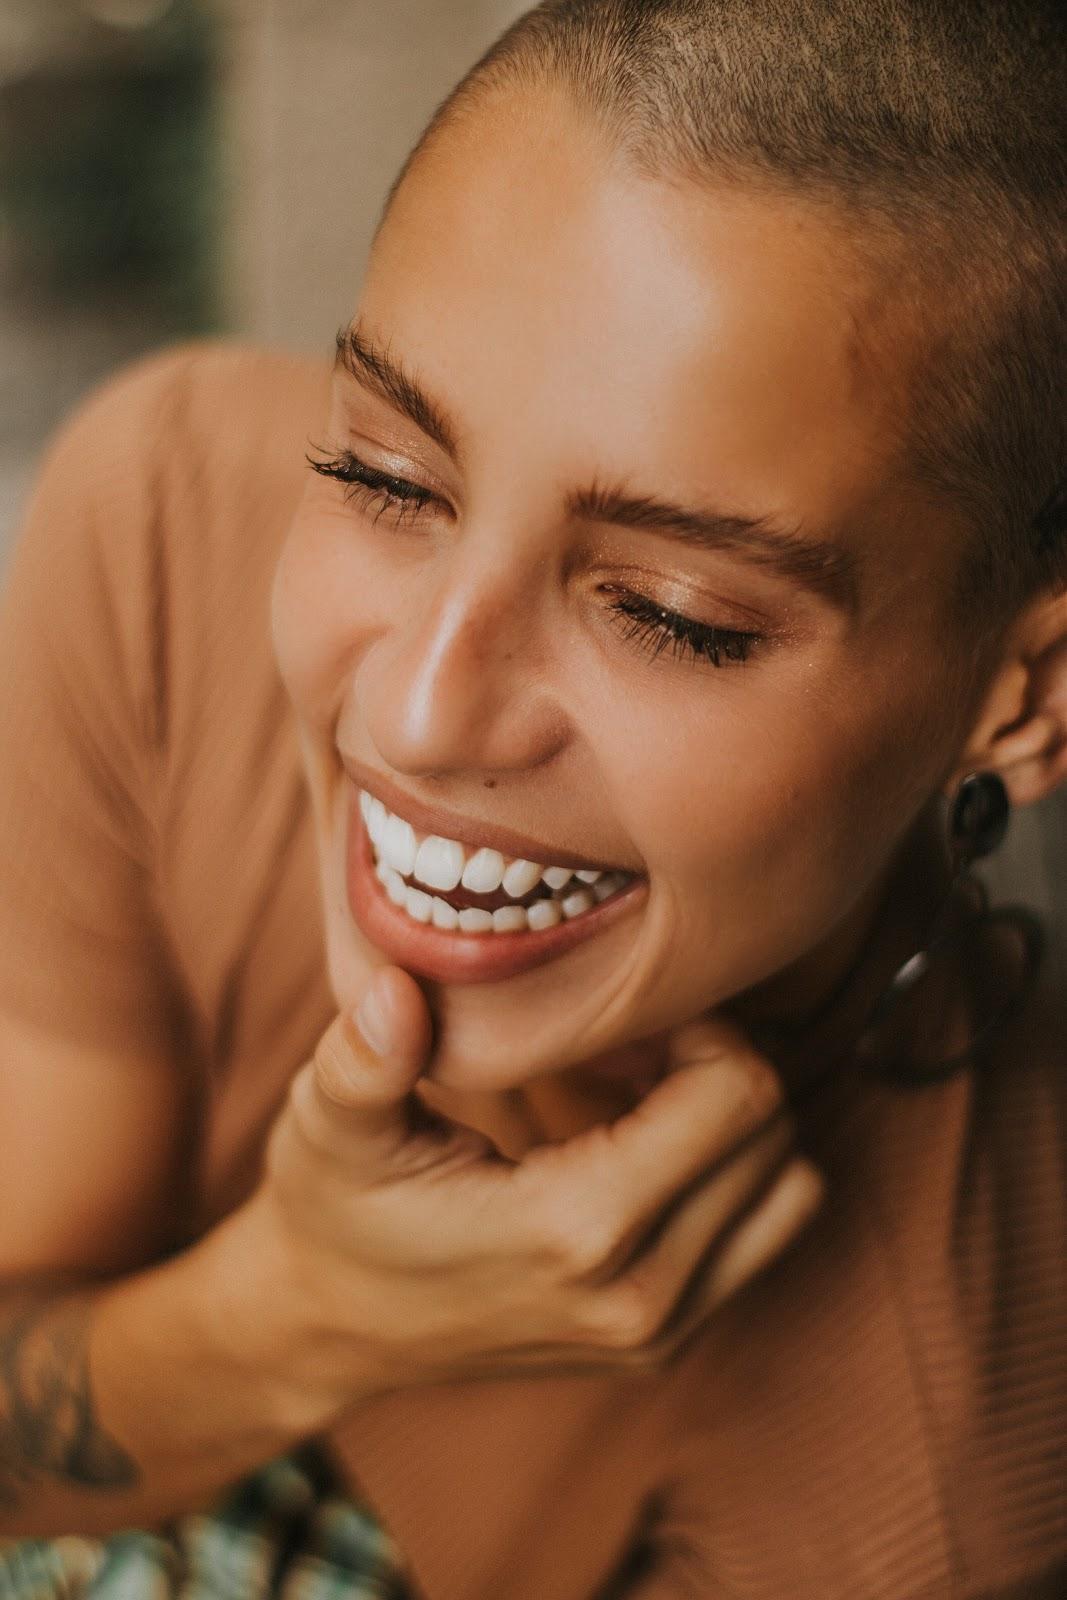 Smile (skin tone)